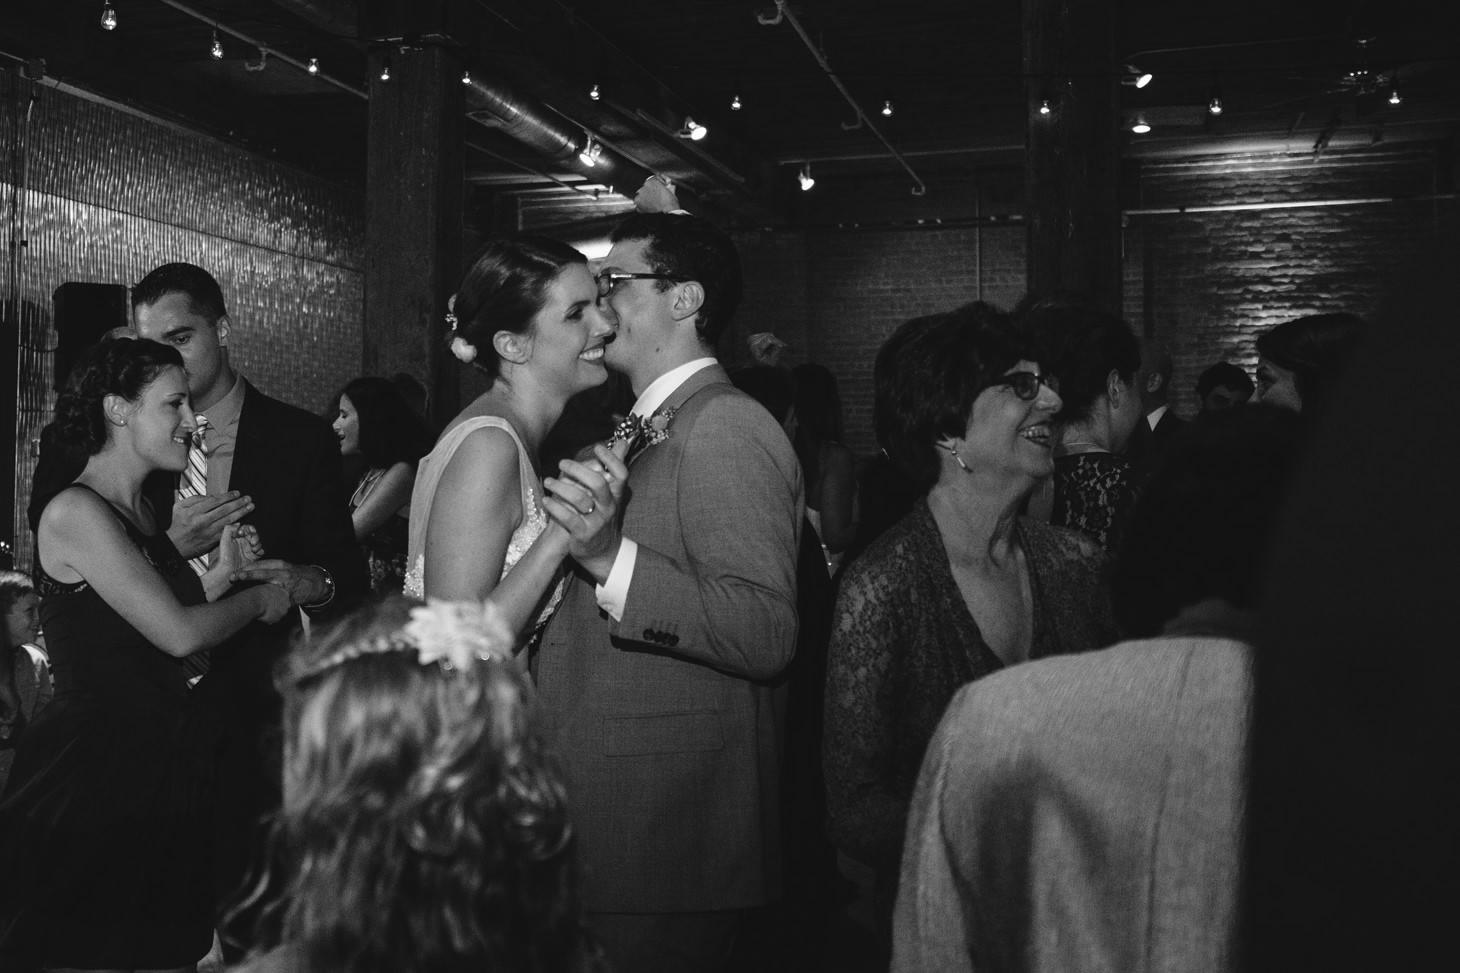 048-nyc-dumbo-loft-brooklyn-wedding-photographer-smitten-chickens-photo-.jpg